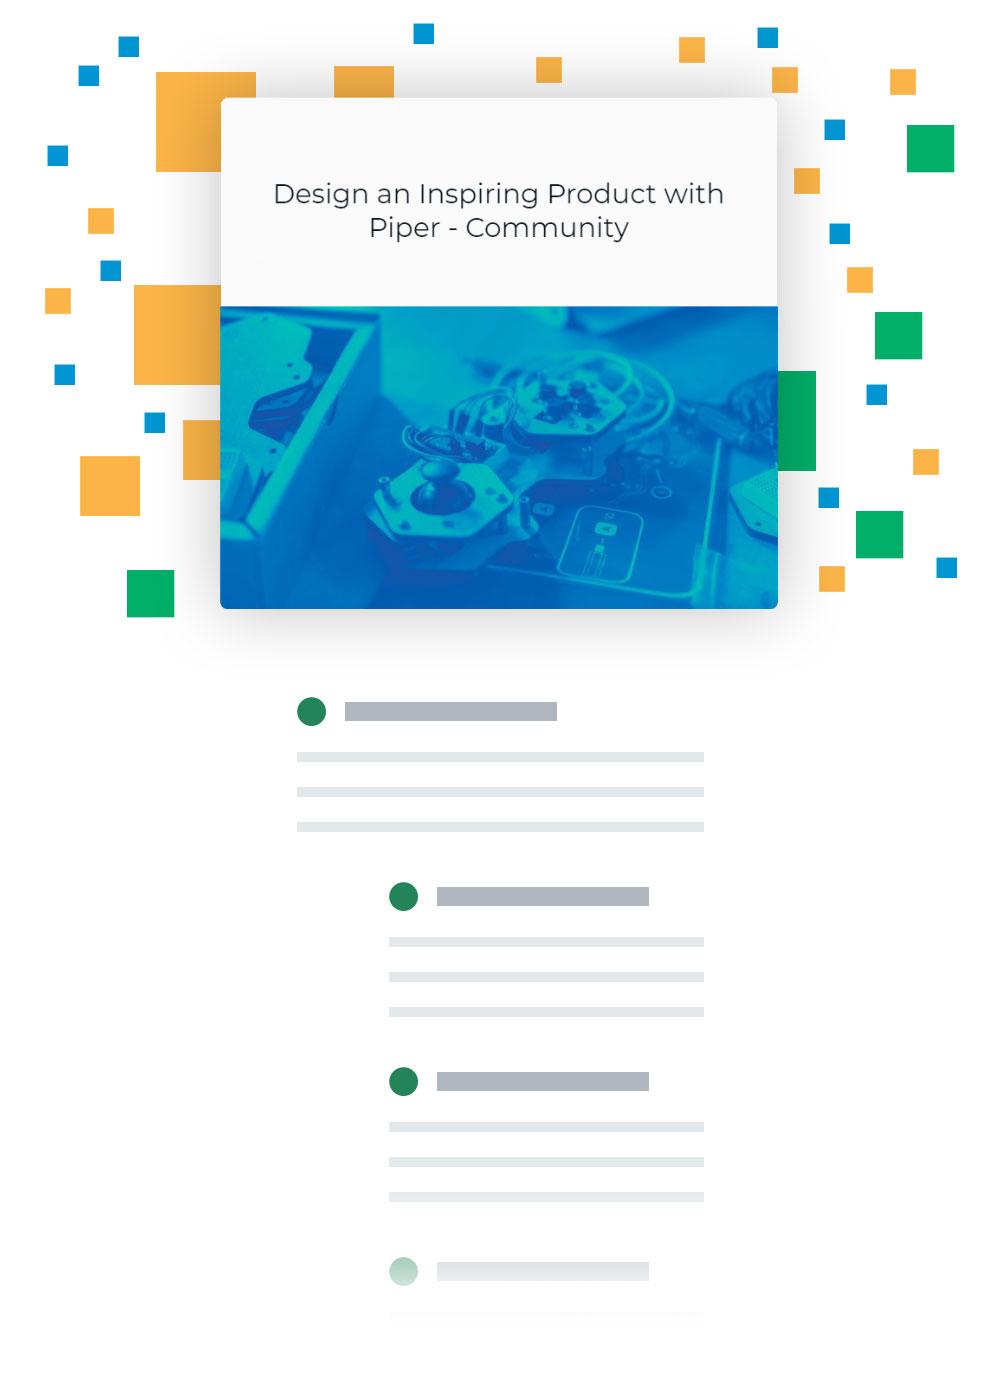 Piper DesignClass community